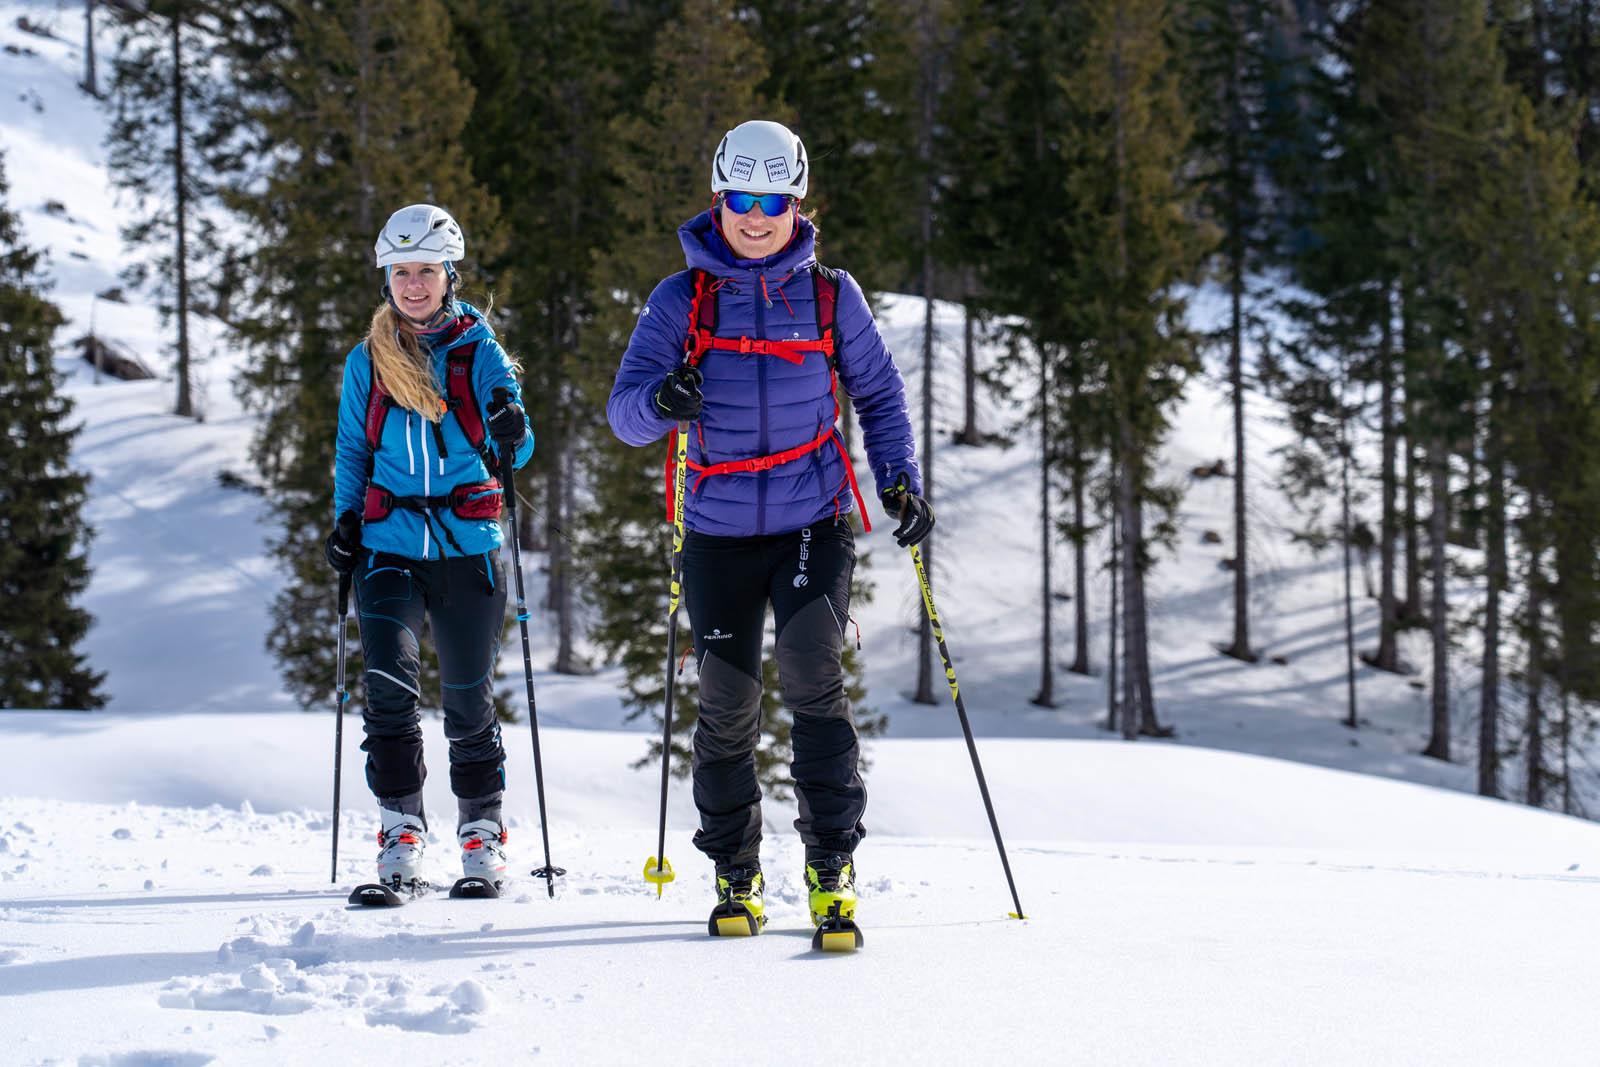 Skitour route in Salzburg